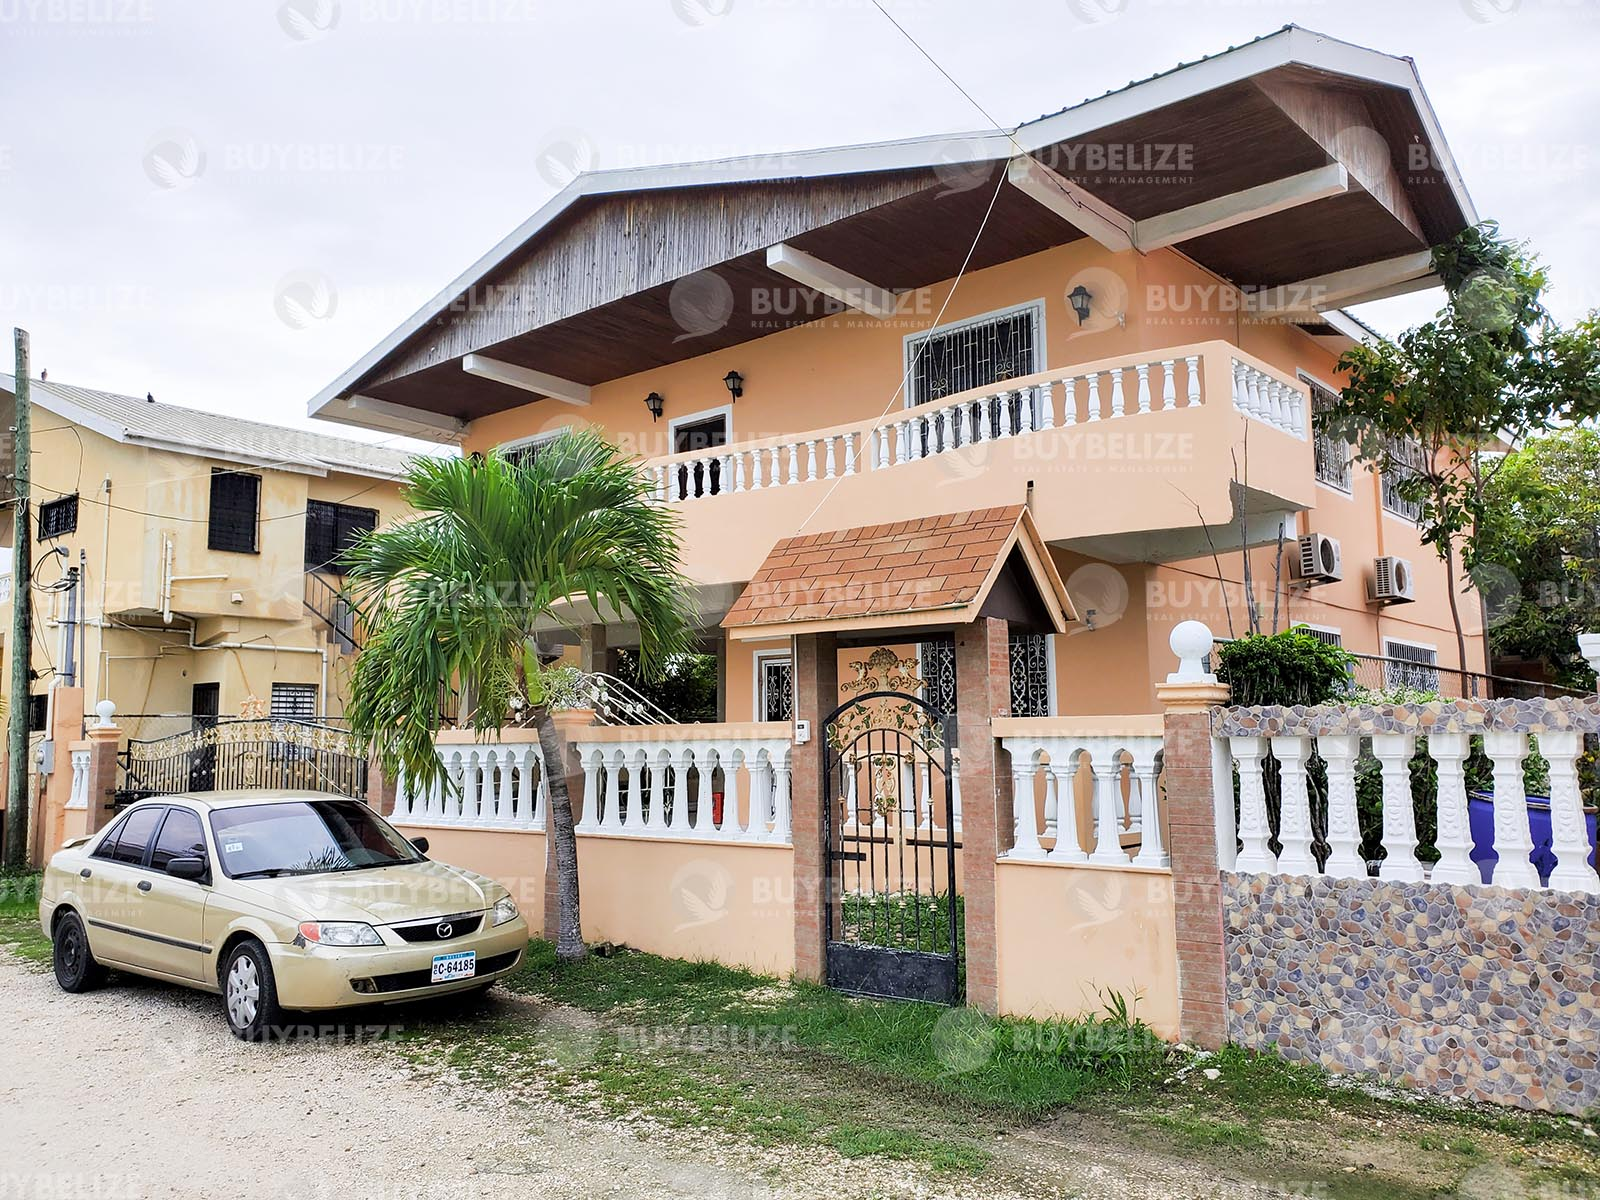 5 bedroom 3.5 Bathroom House For Rent In Belama Phase 1